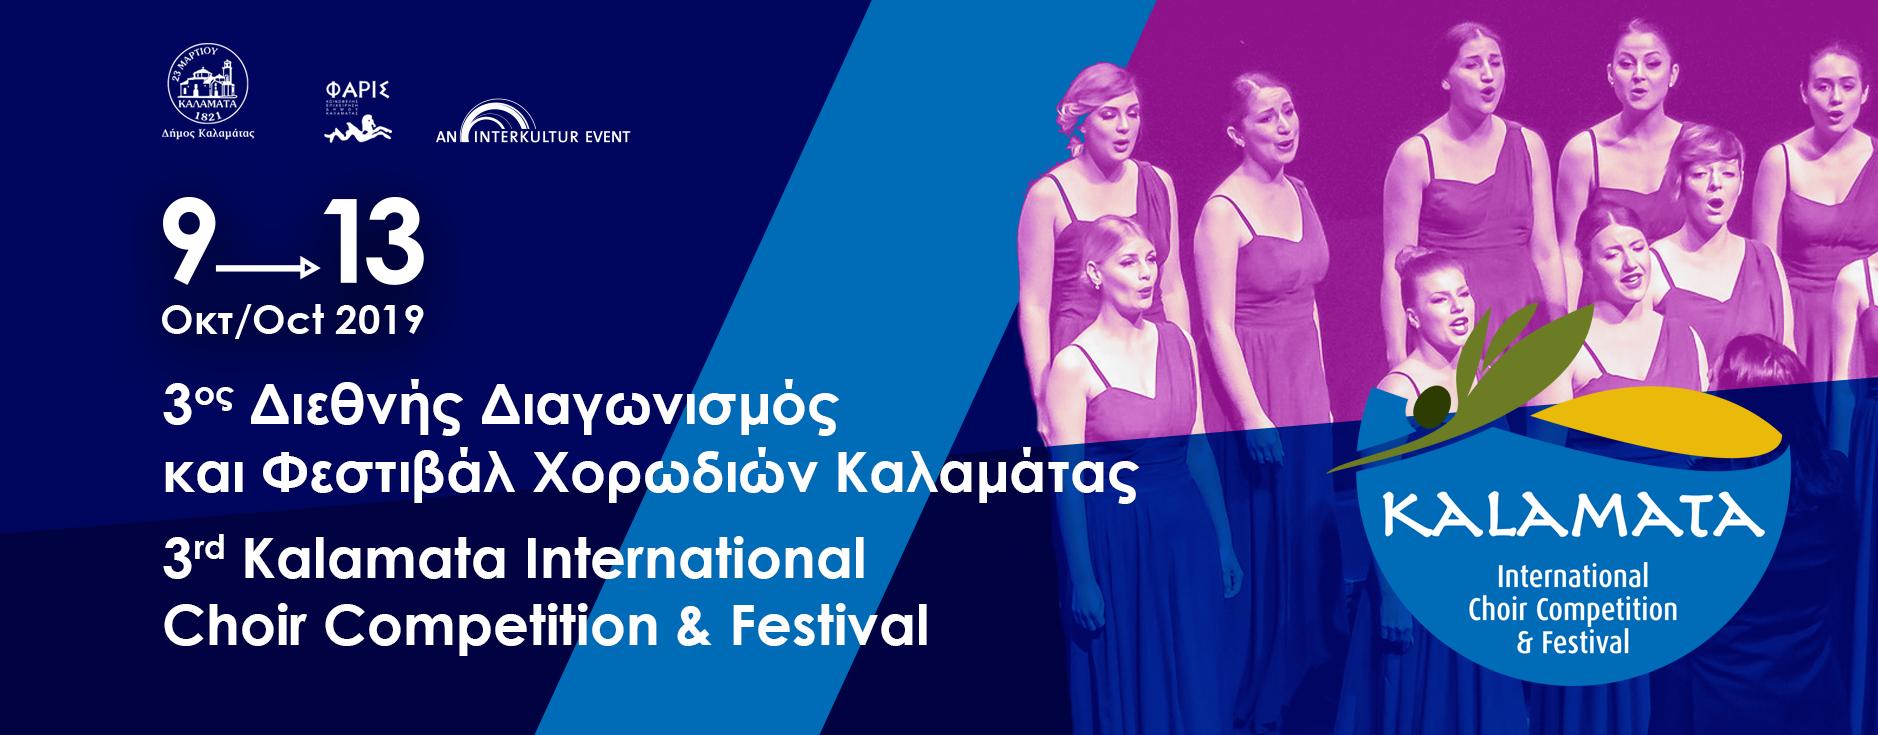 festival_kalamata2019